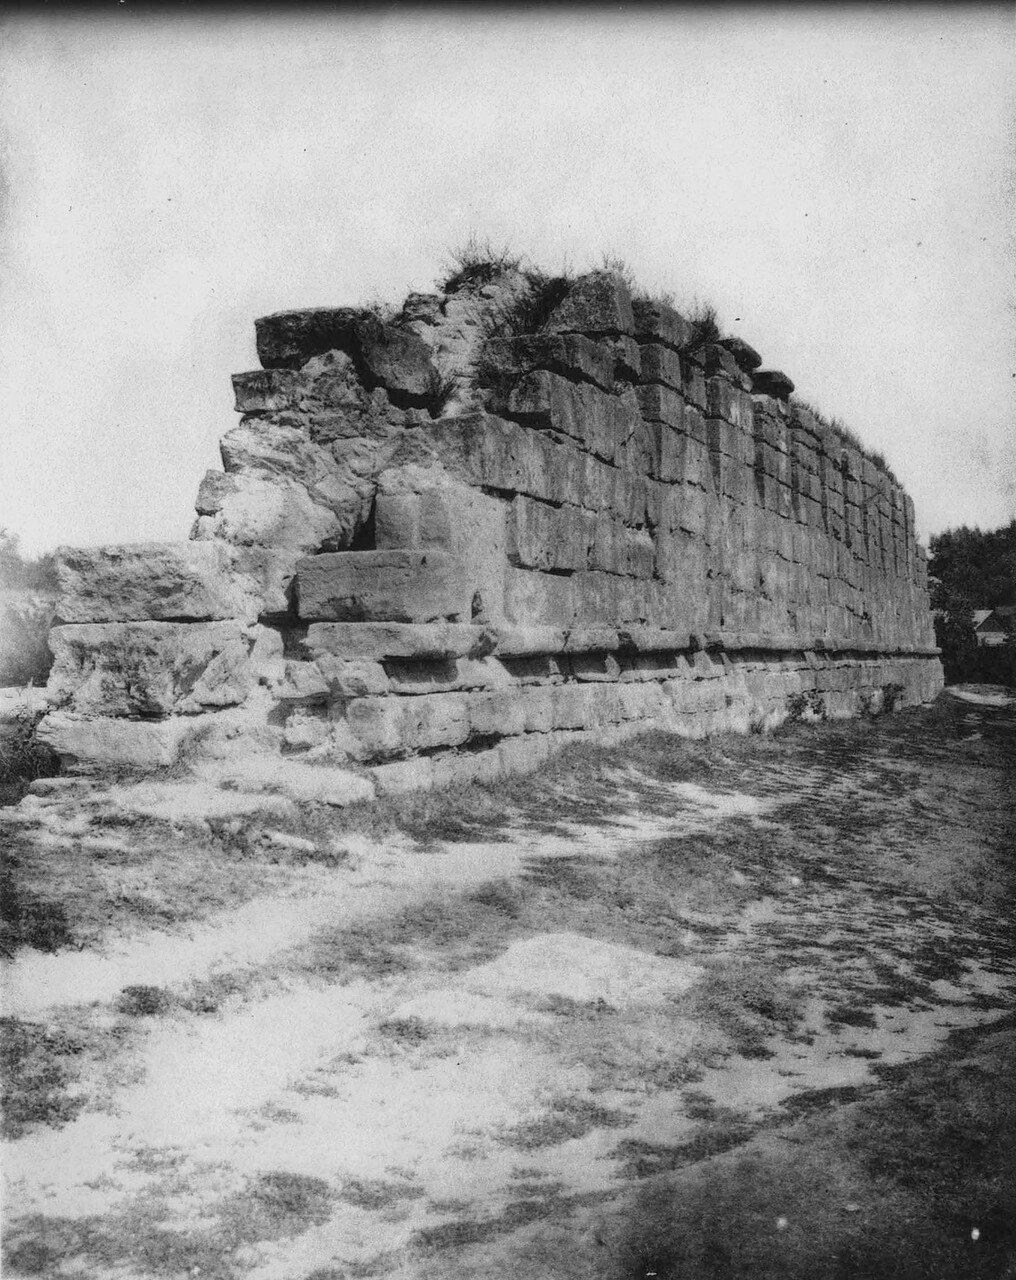 Кремль, участок стены